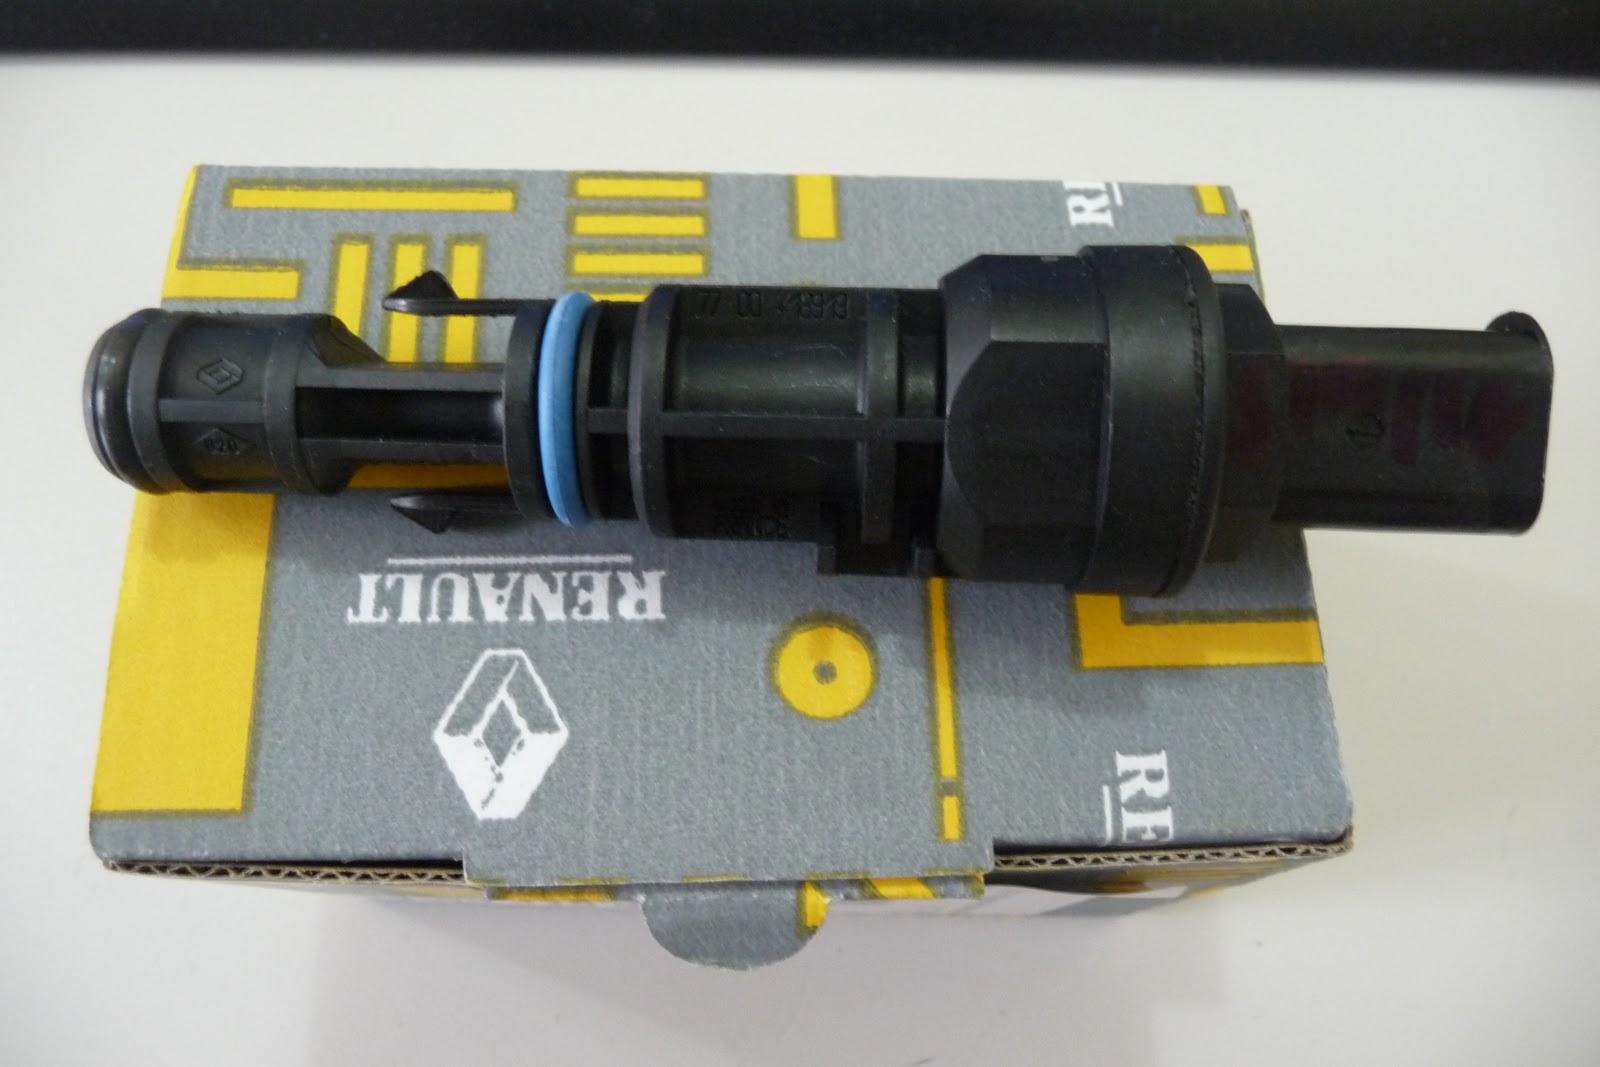 WRG-4423] Proton Saga Blm Fuse Box Diagram